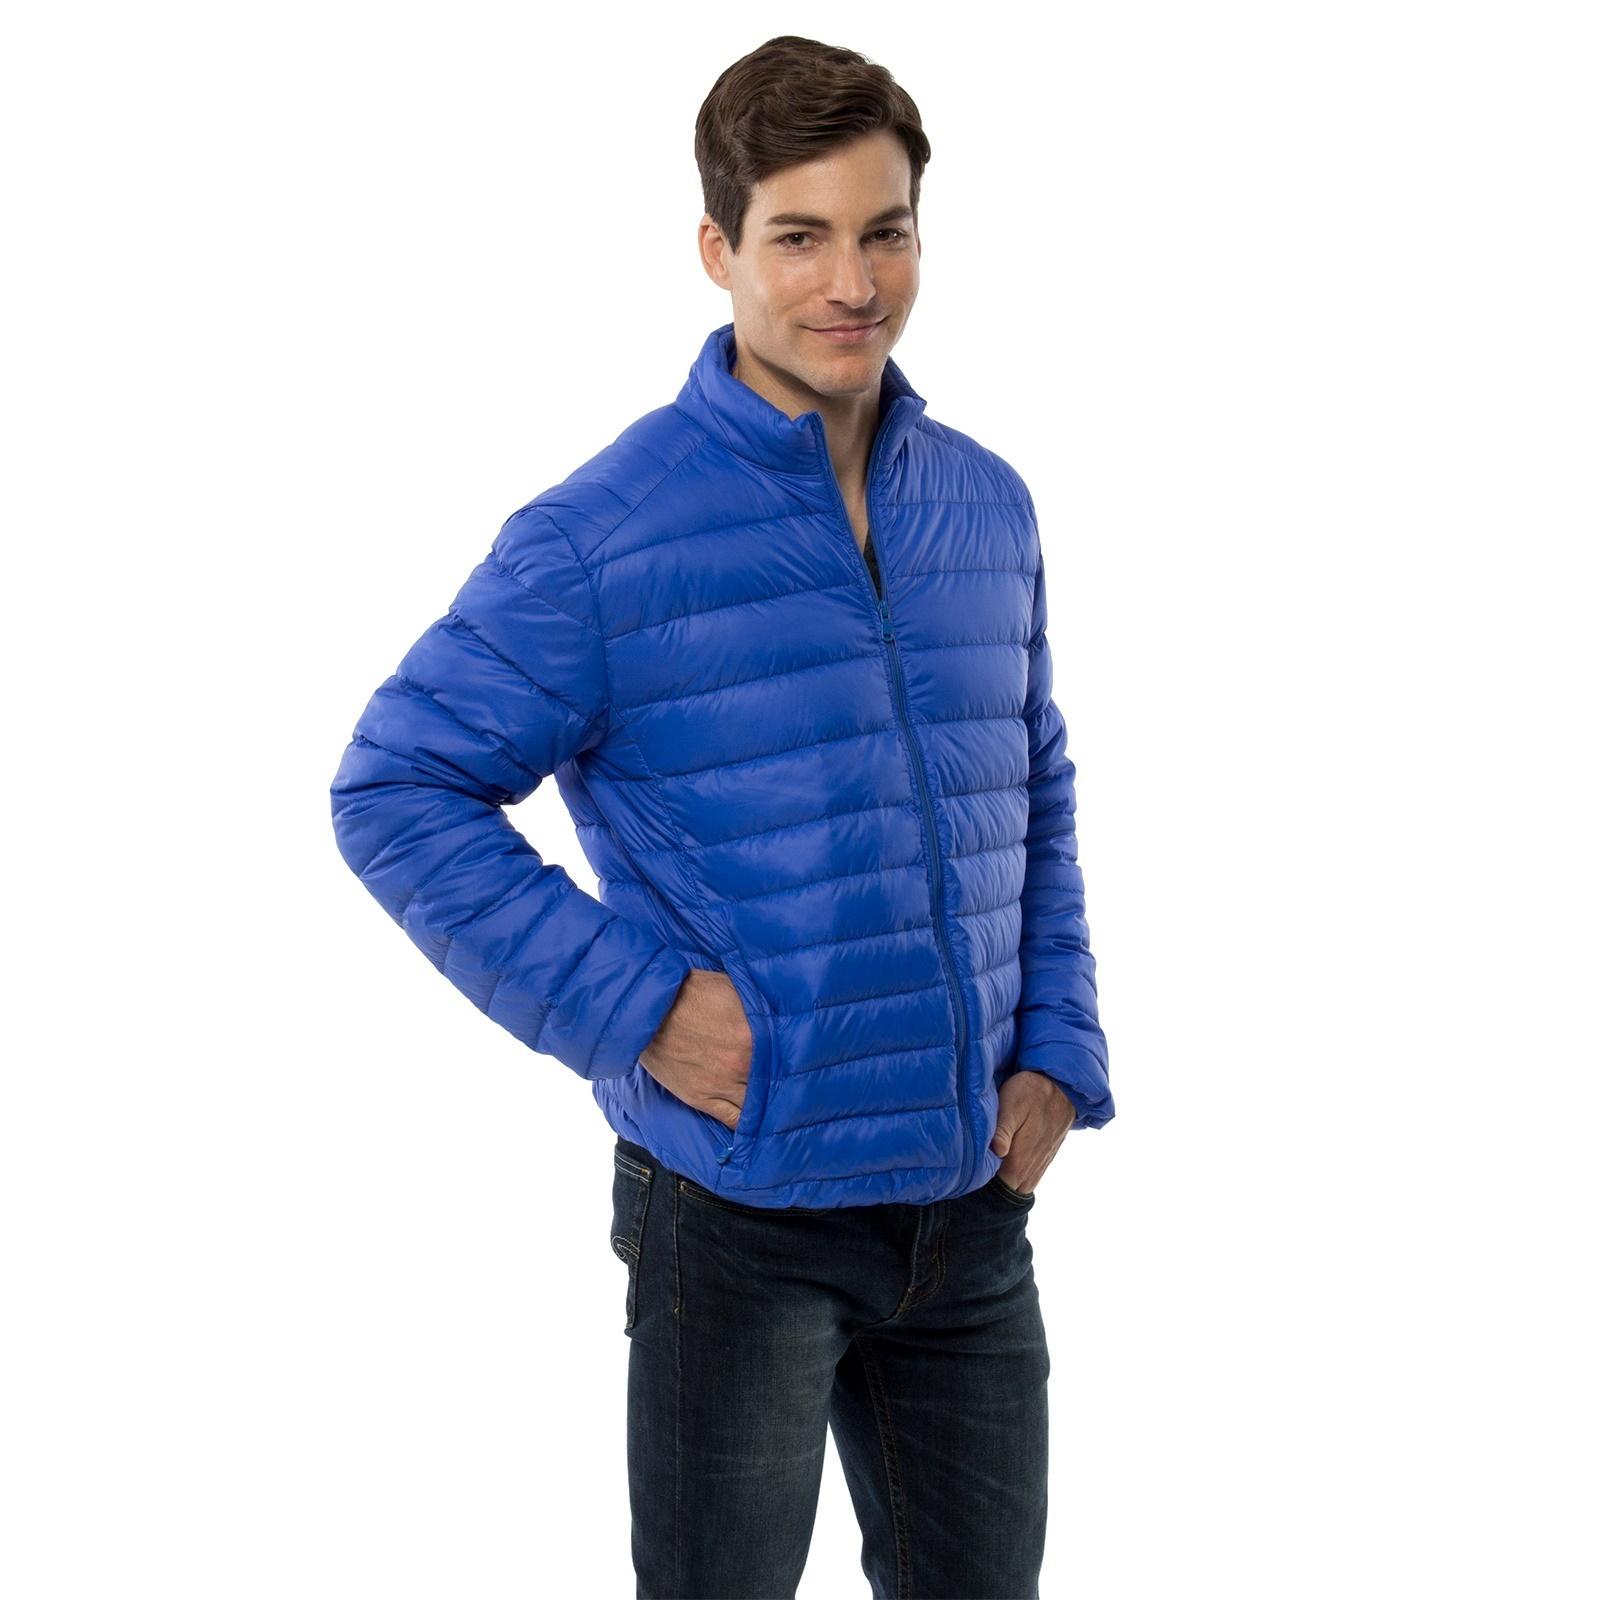 bab5becb28d Alpine Swiss Niko Men's Down Jacket Puffer Bubble Coat Packable Light Warm  Parka $24.99